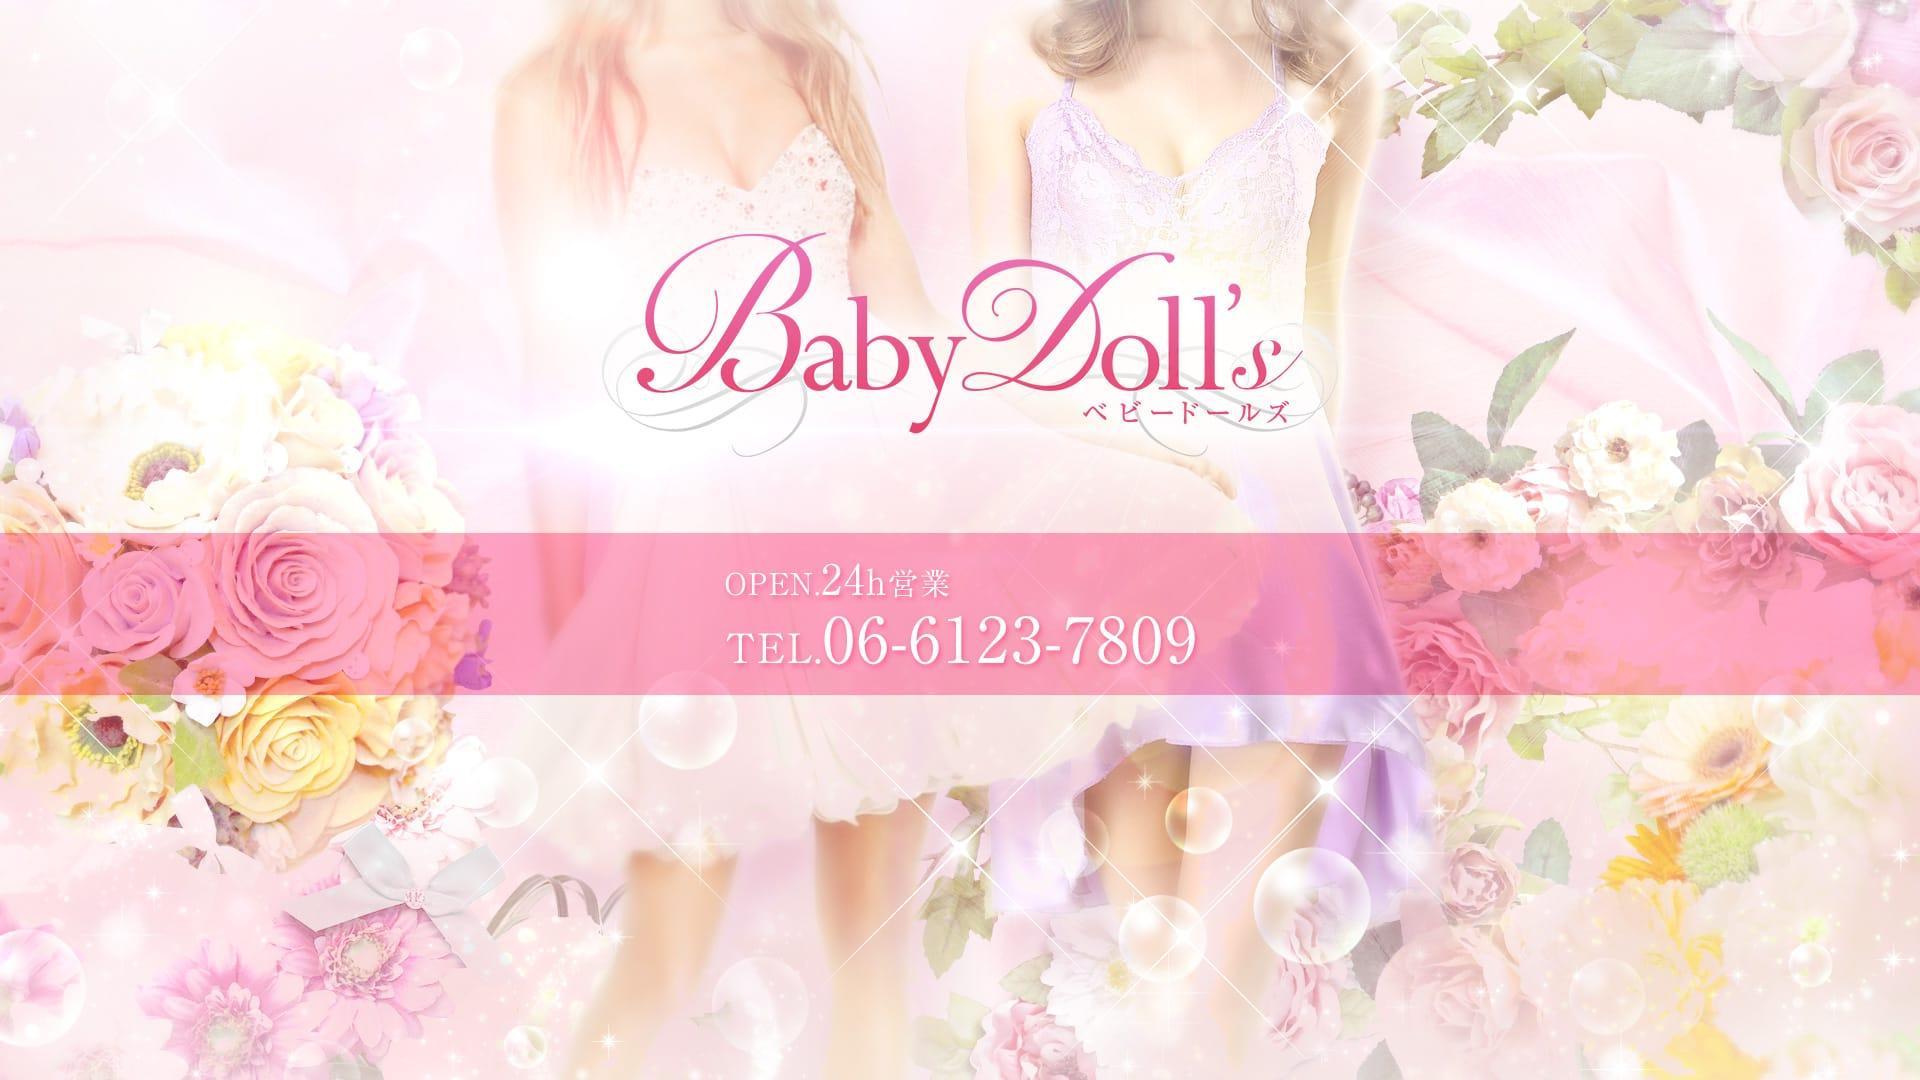 Baby Doll's(ベビードールズ)